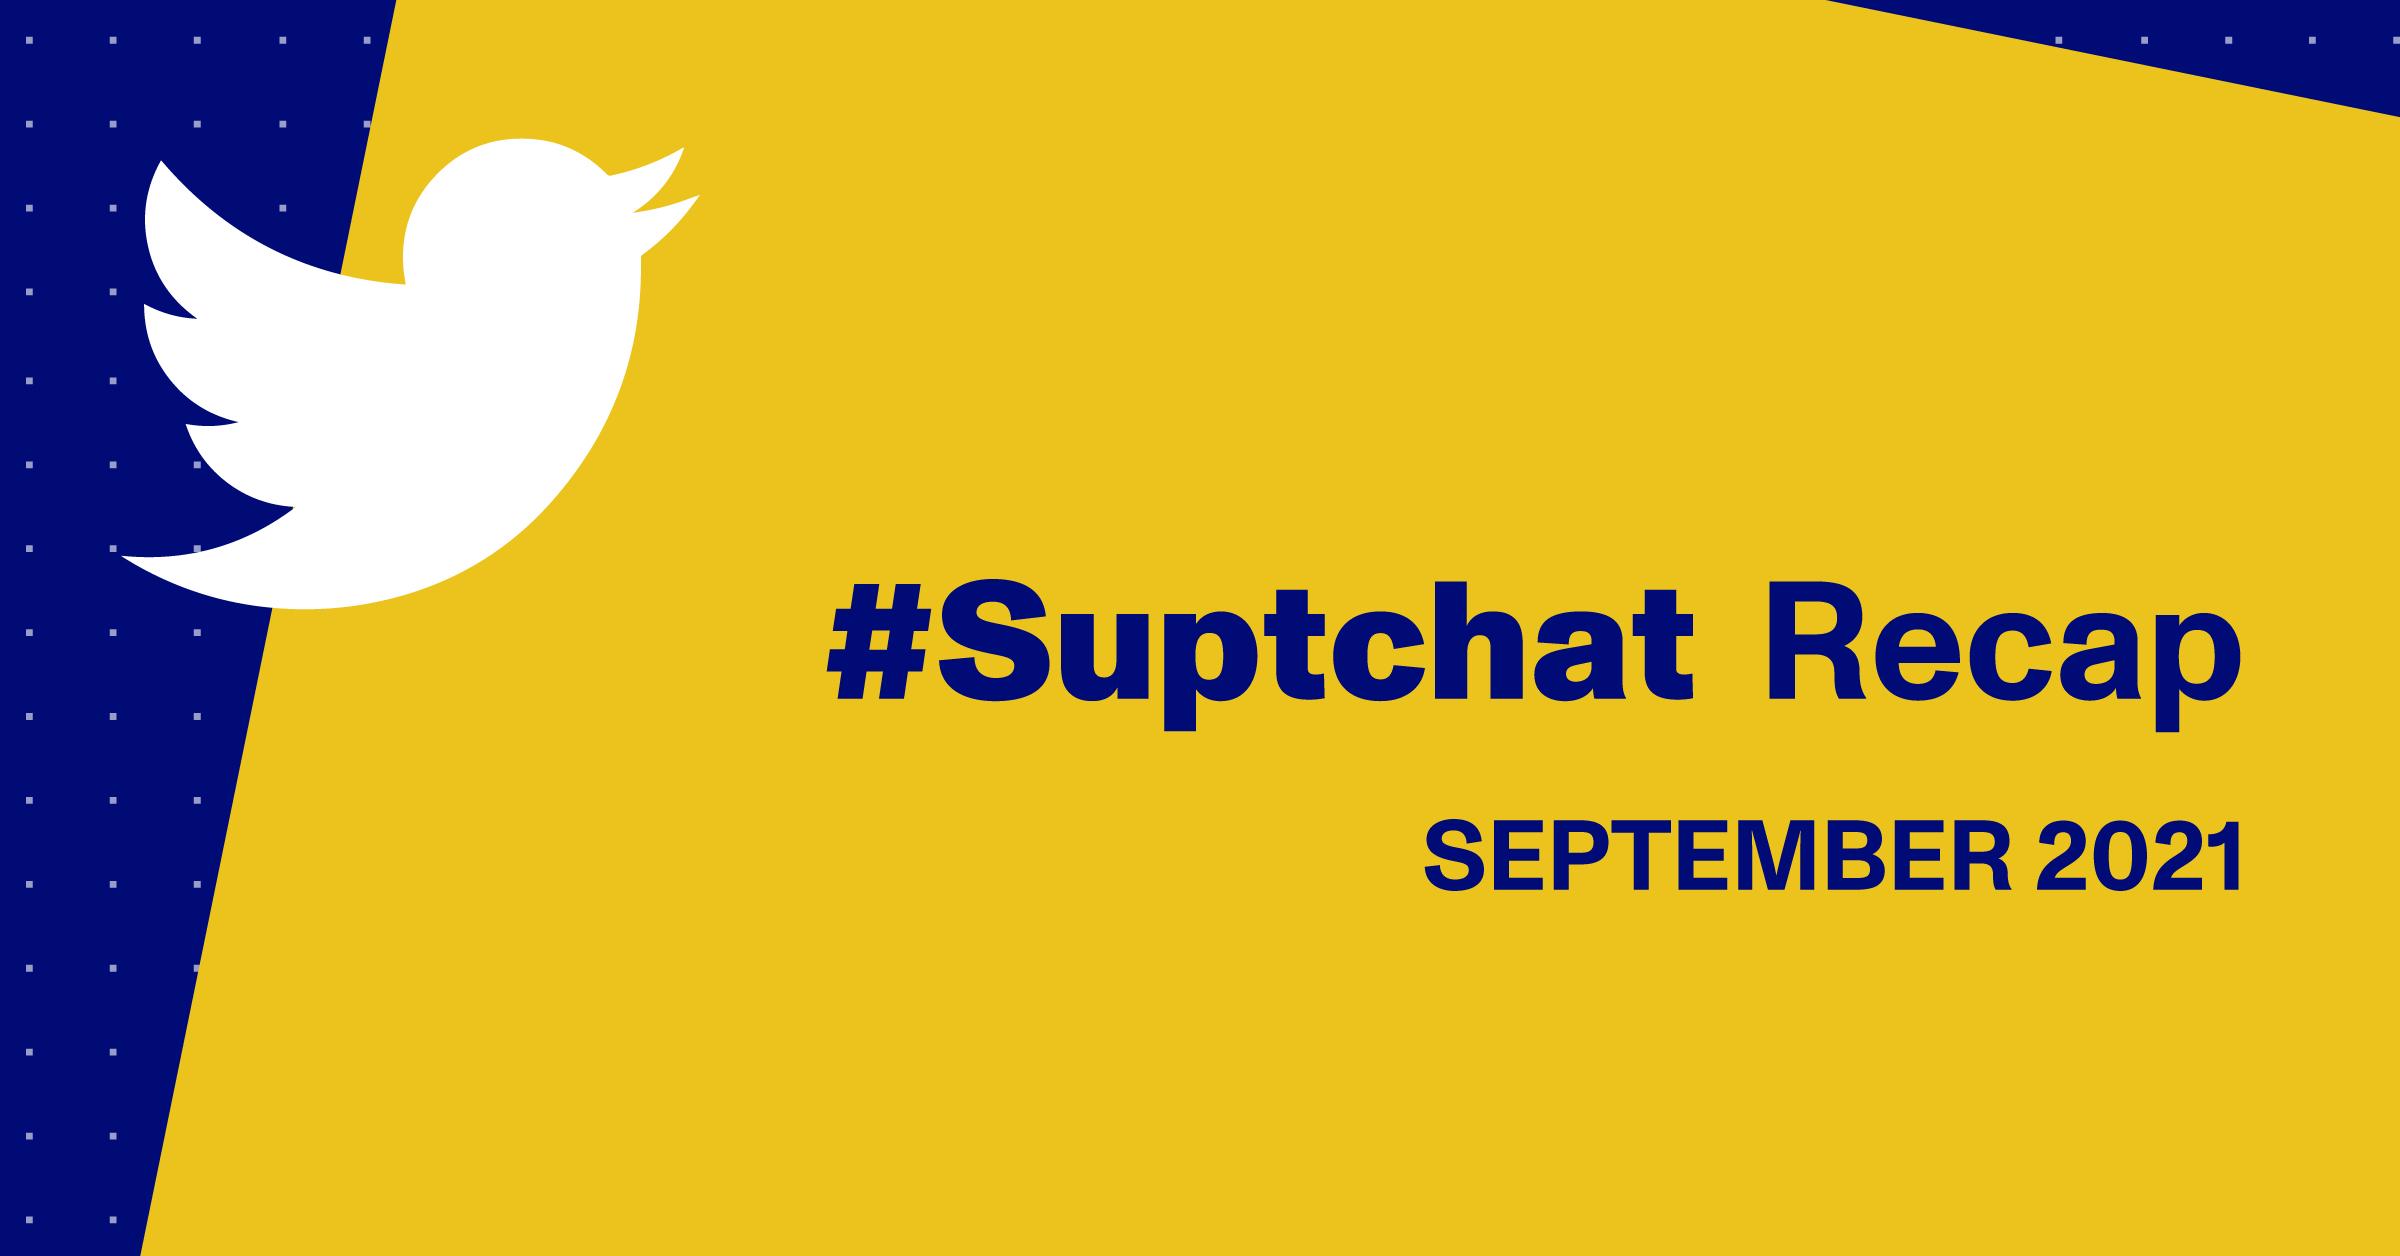 Suptchat Recap graphic - September 2021